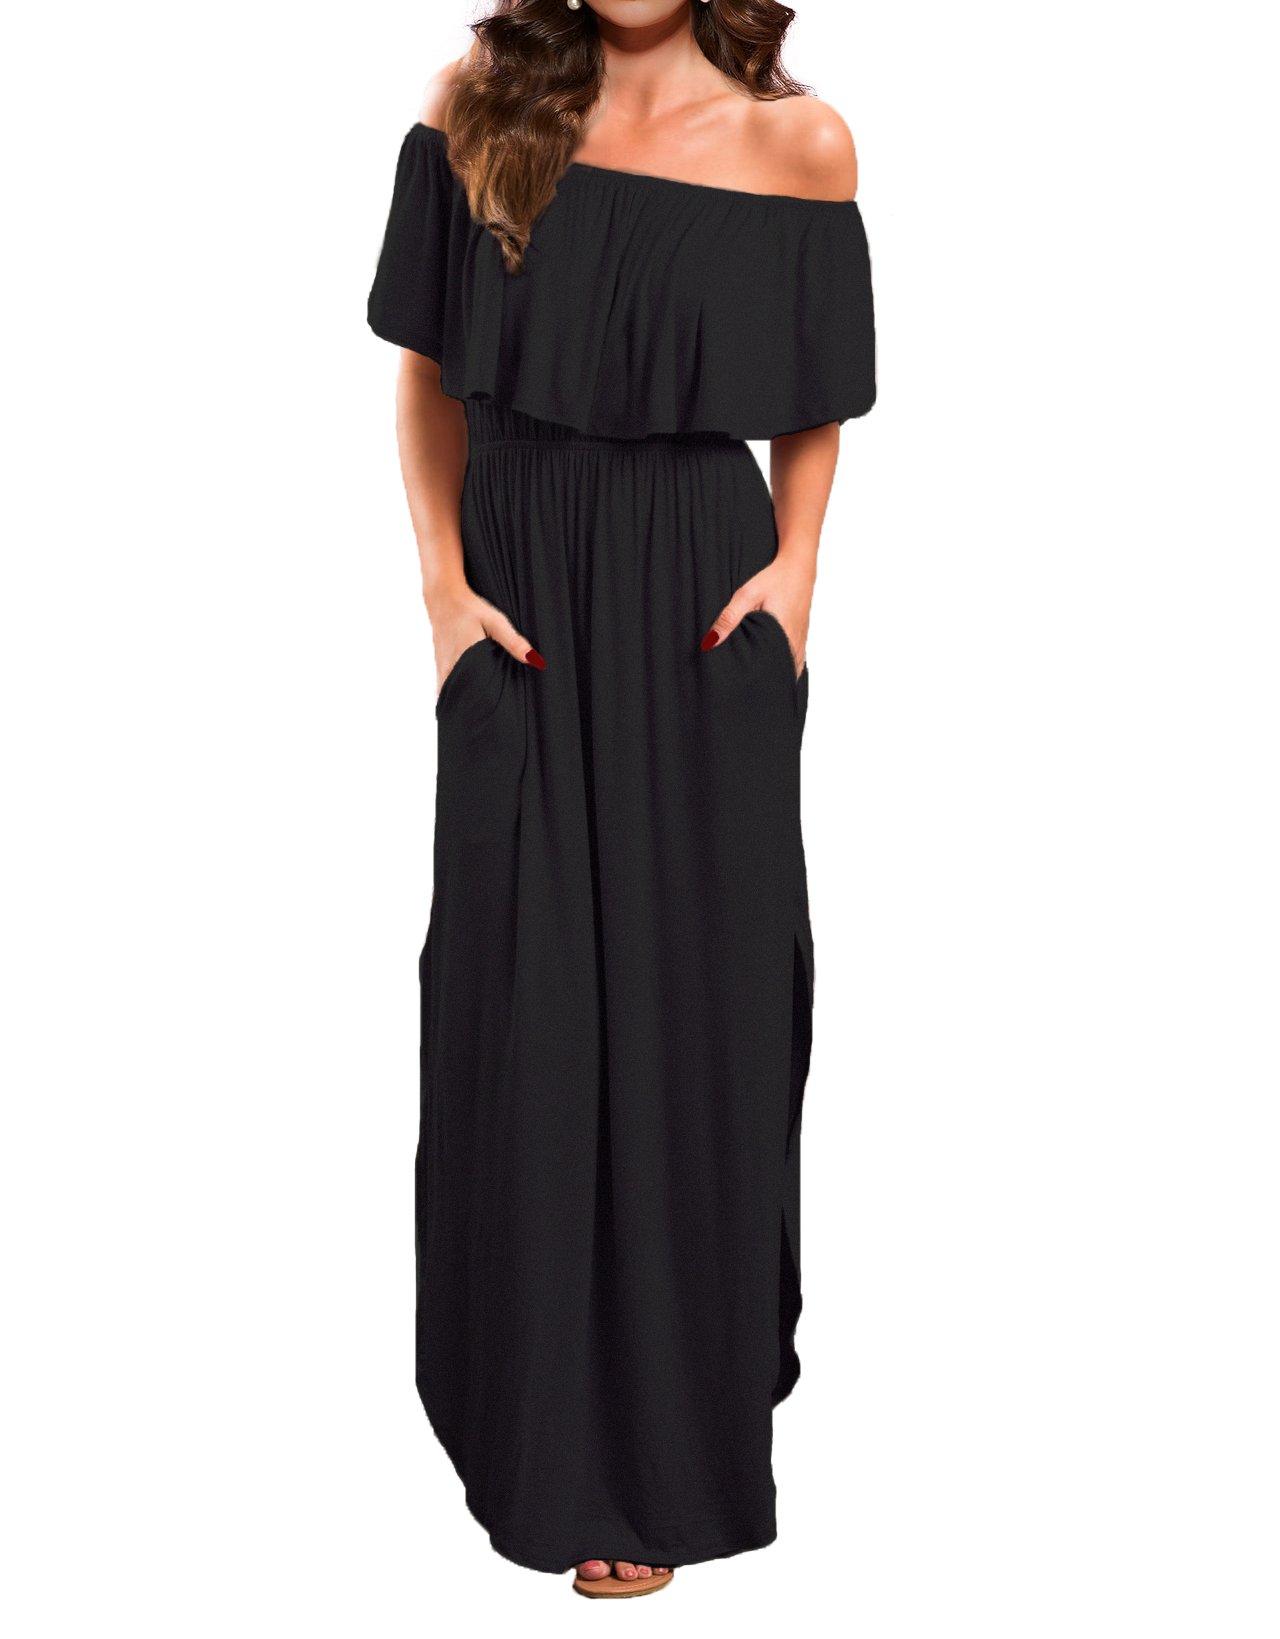 VERABENDI Women's Off Shoulder Summer Casual Long Ruffle Beach Maxi Dress with Pockets Black L